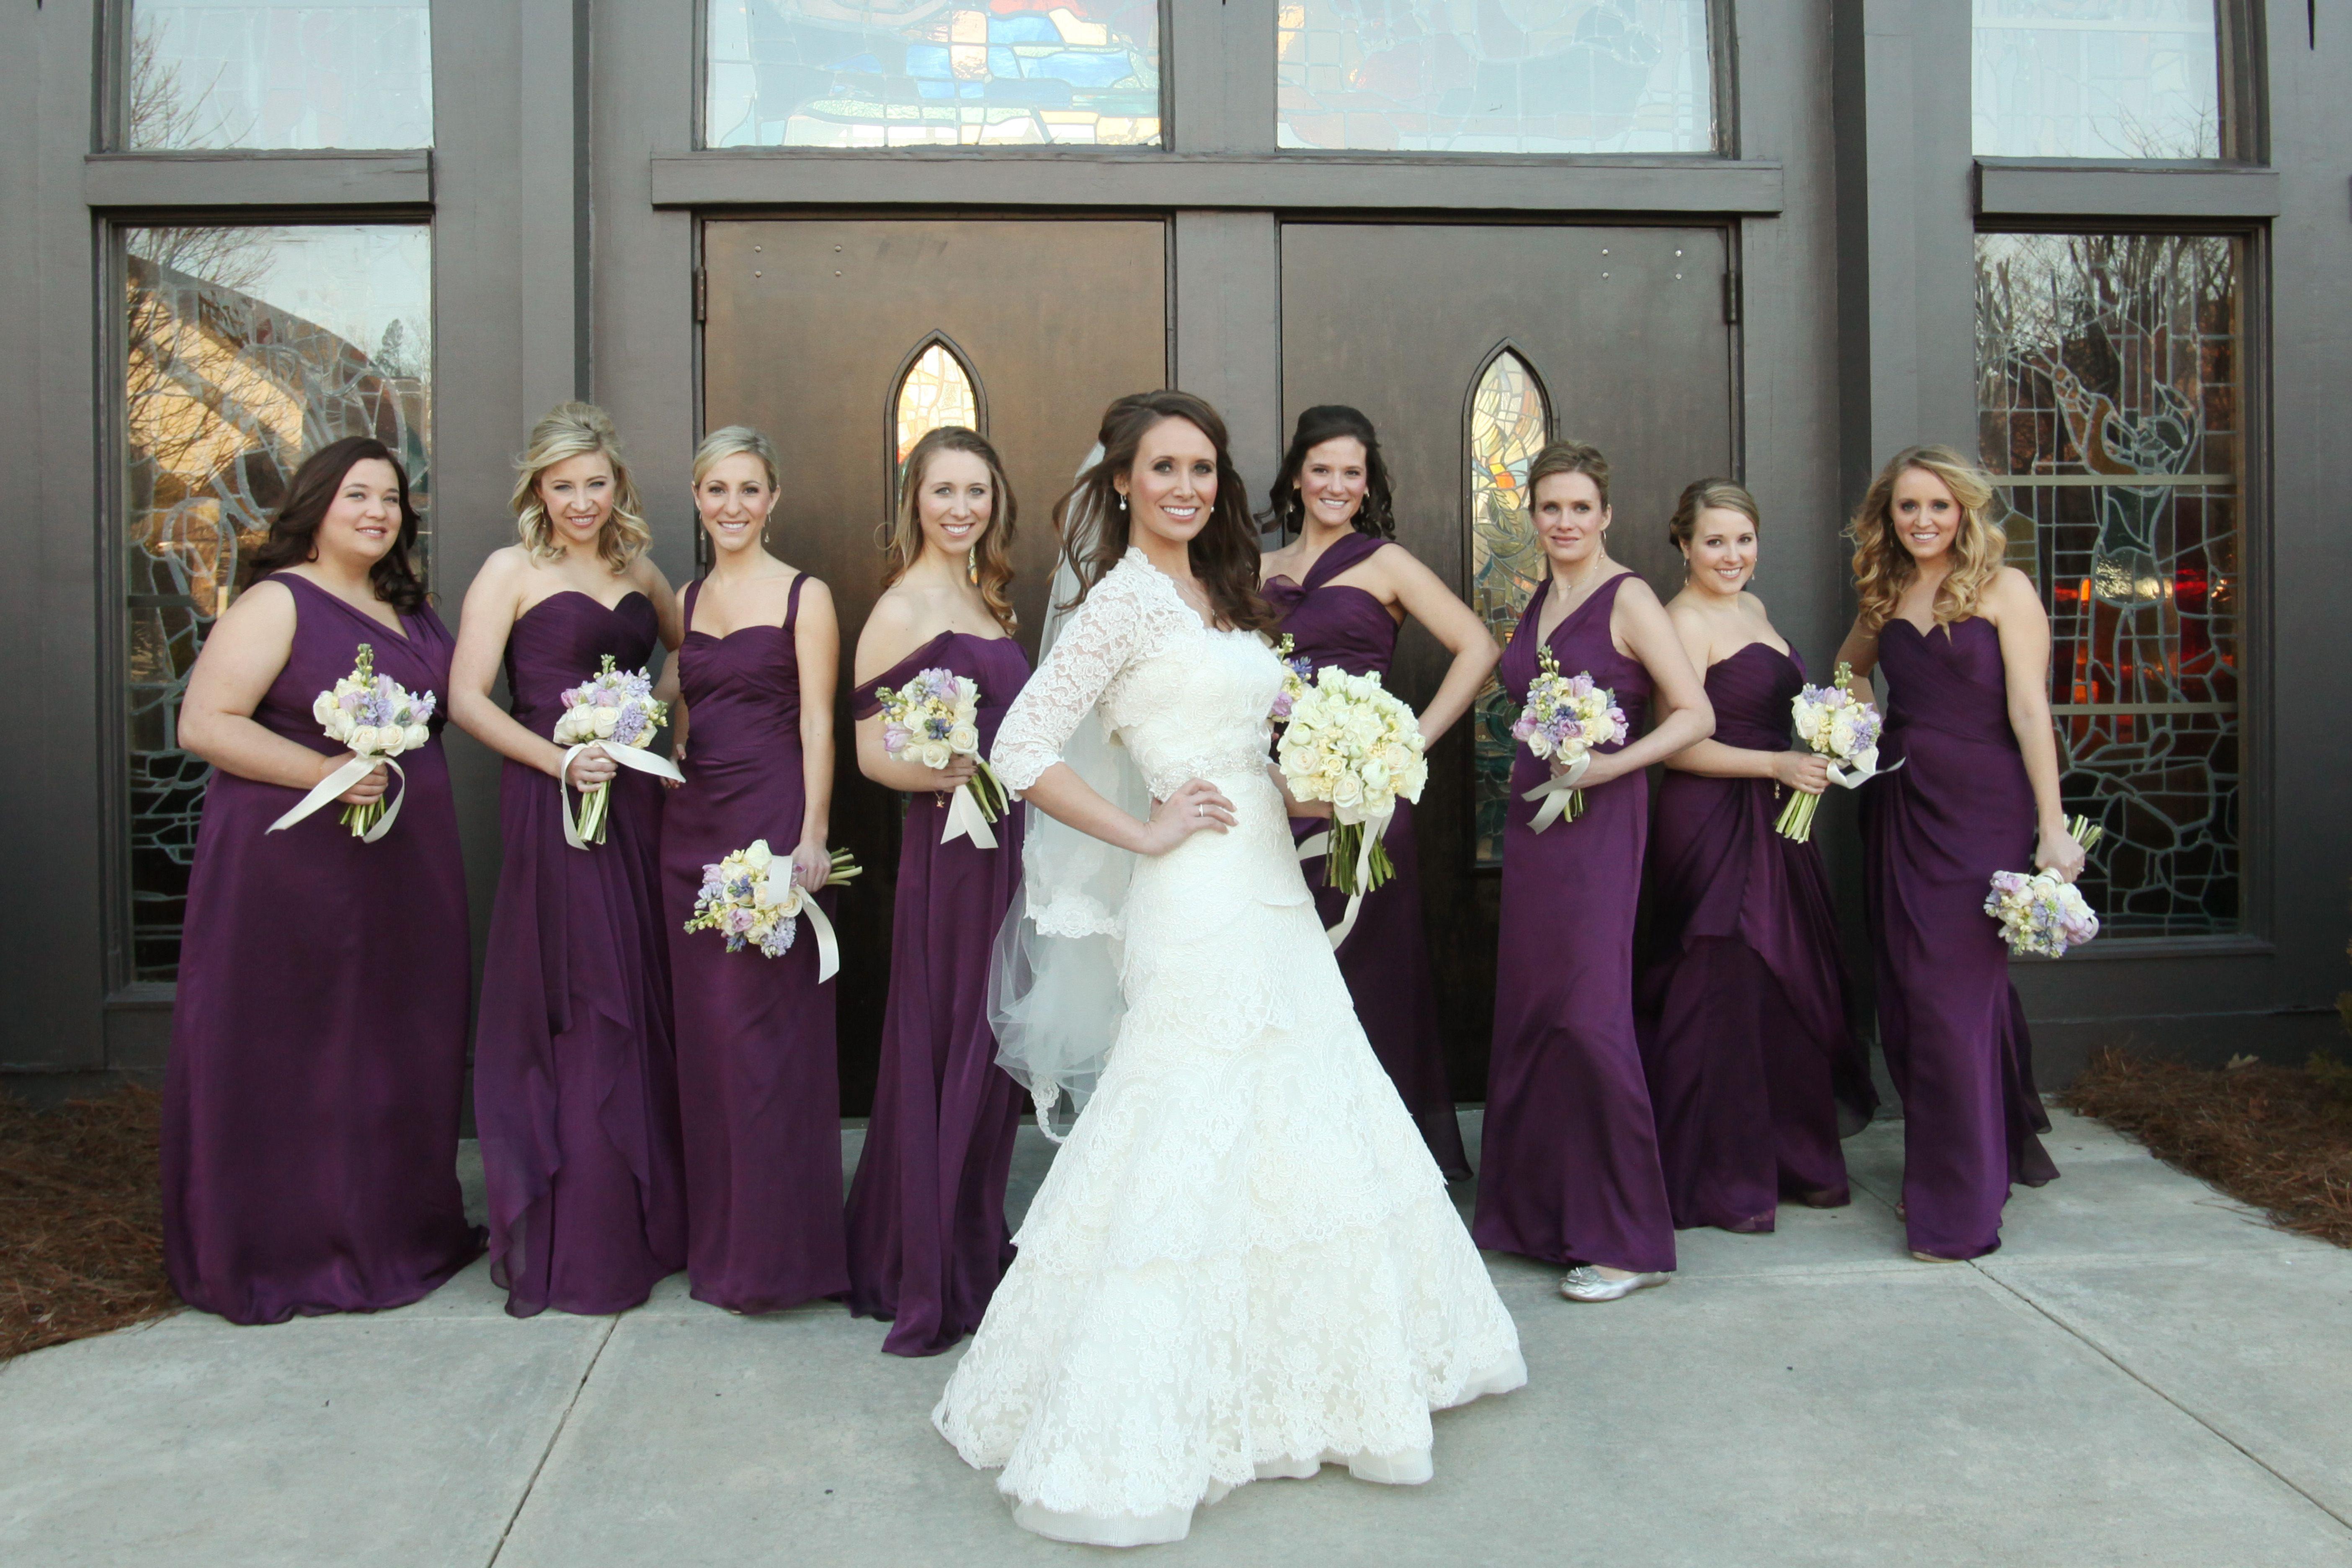 Eggplant Purple Bridesmaids Dresses Wedding Bridesmaids Pinterest